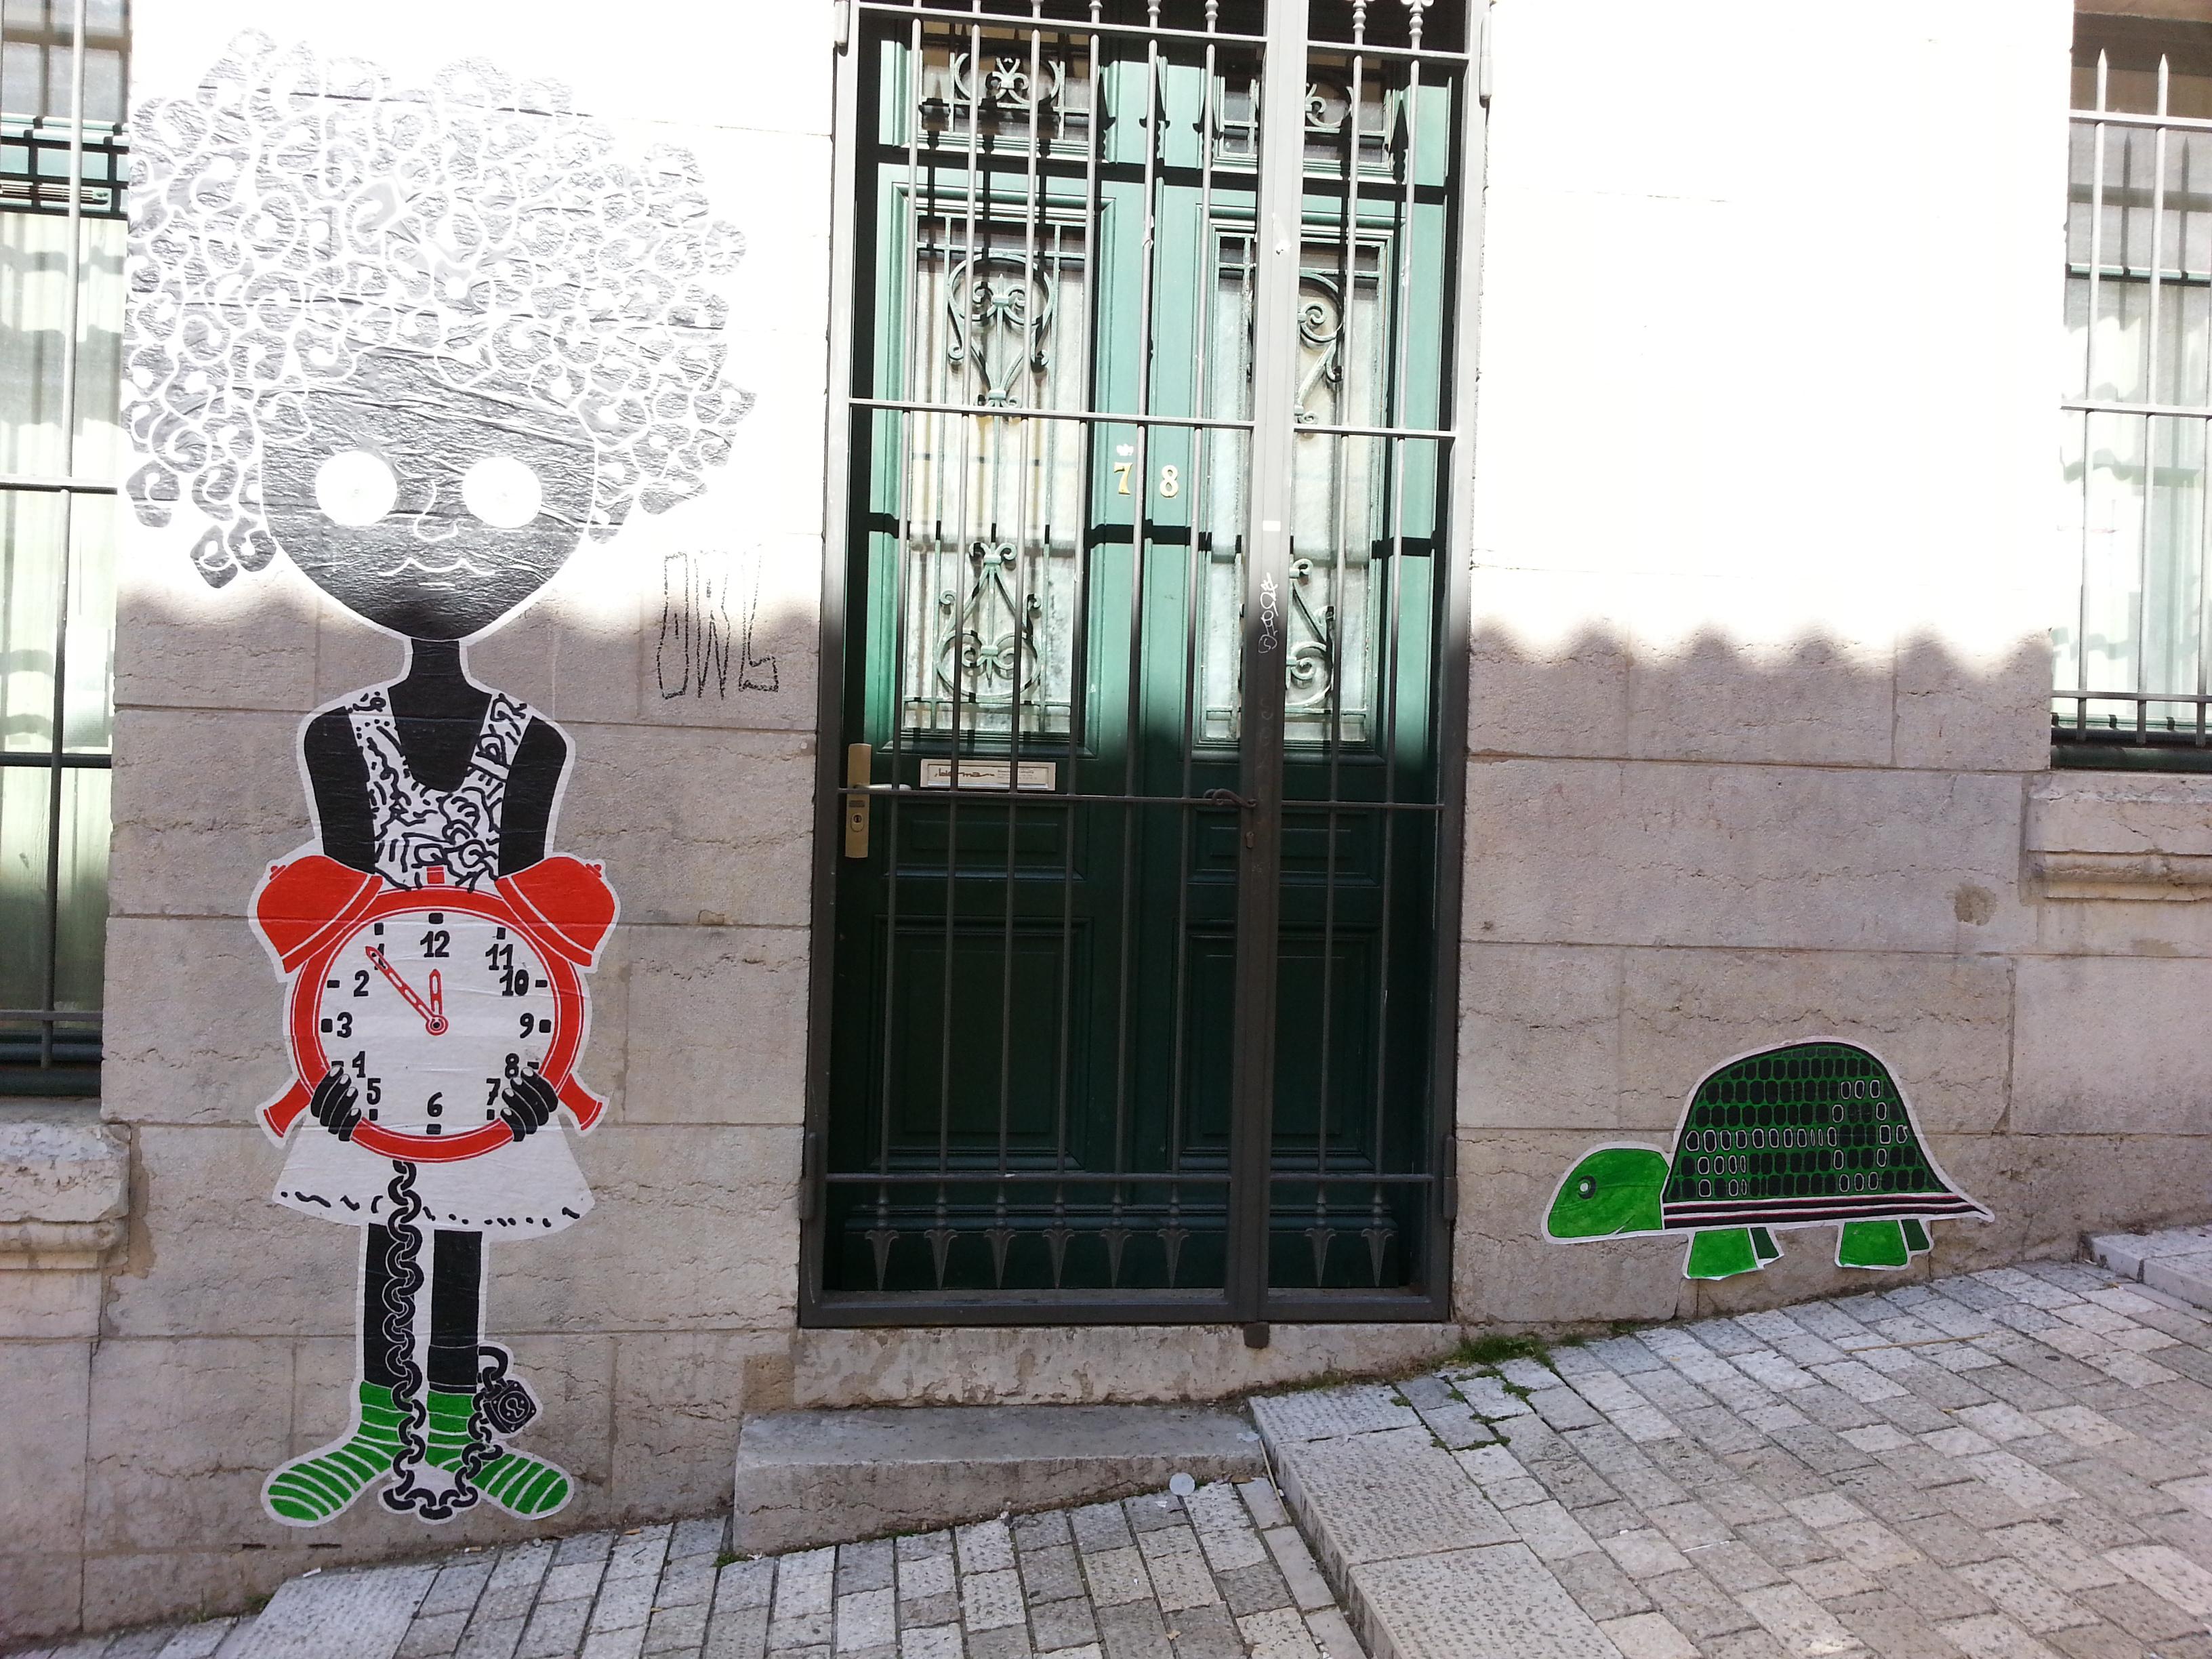 street art pentes croix rousse lyon 14